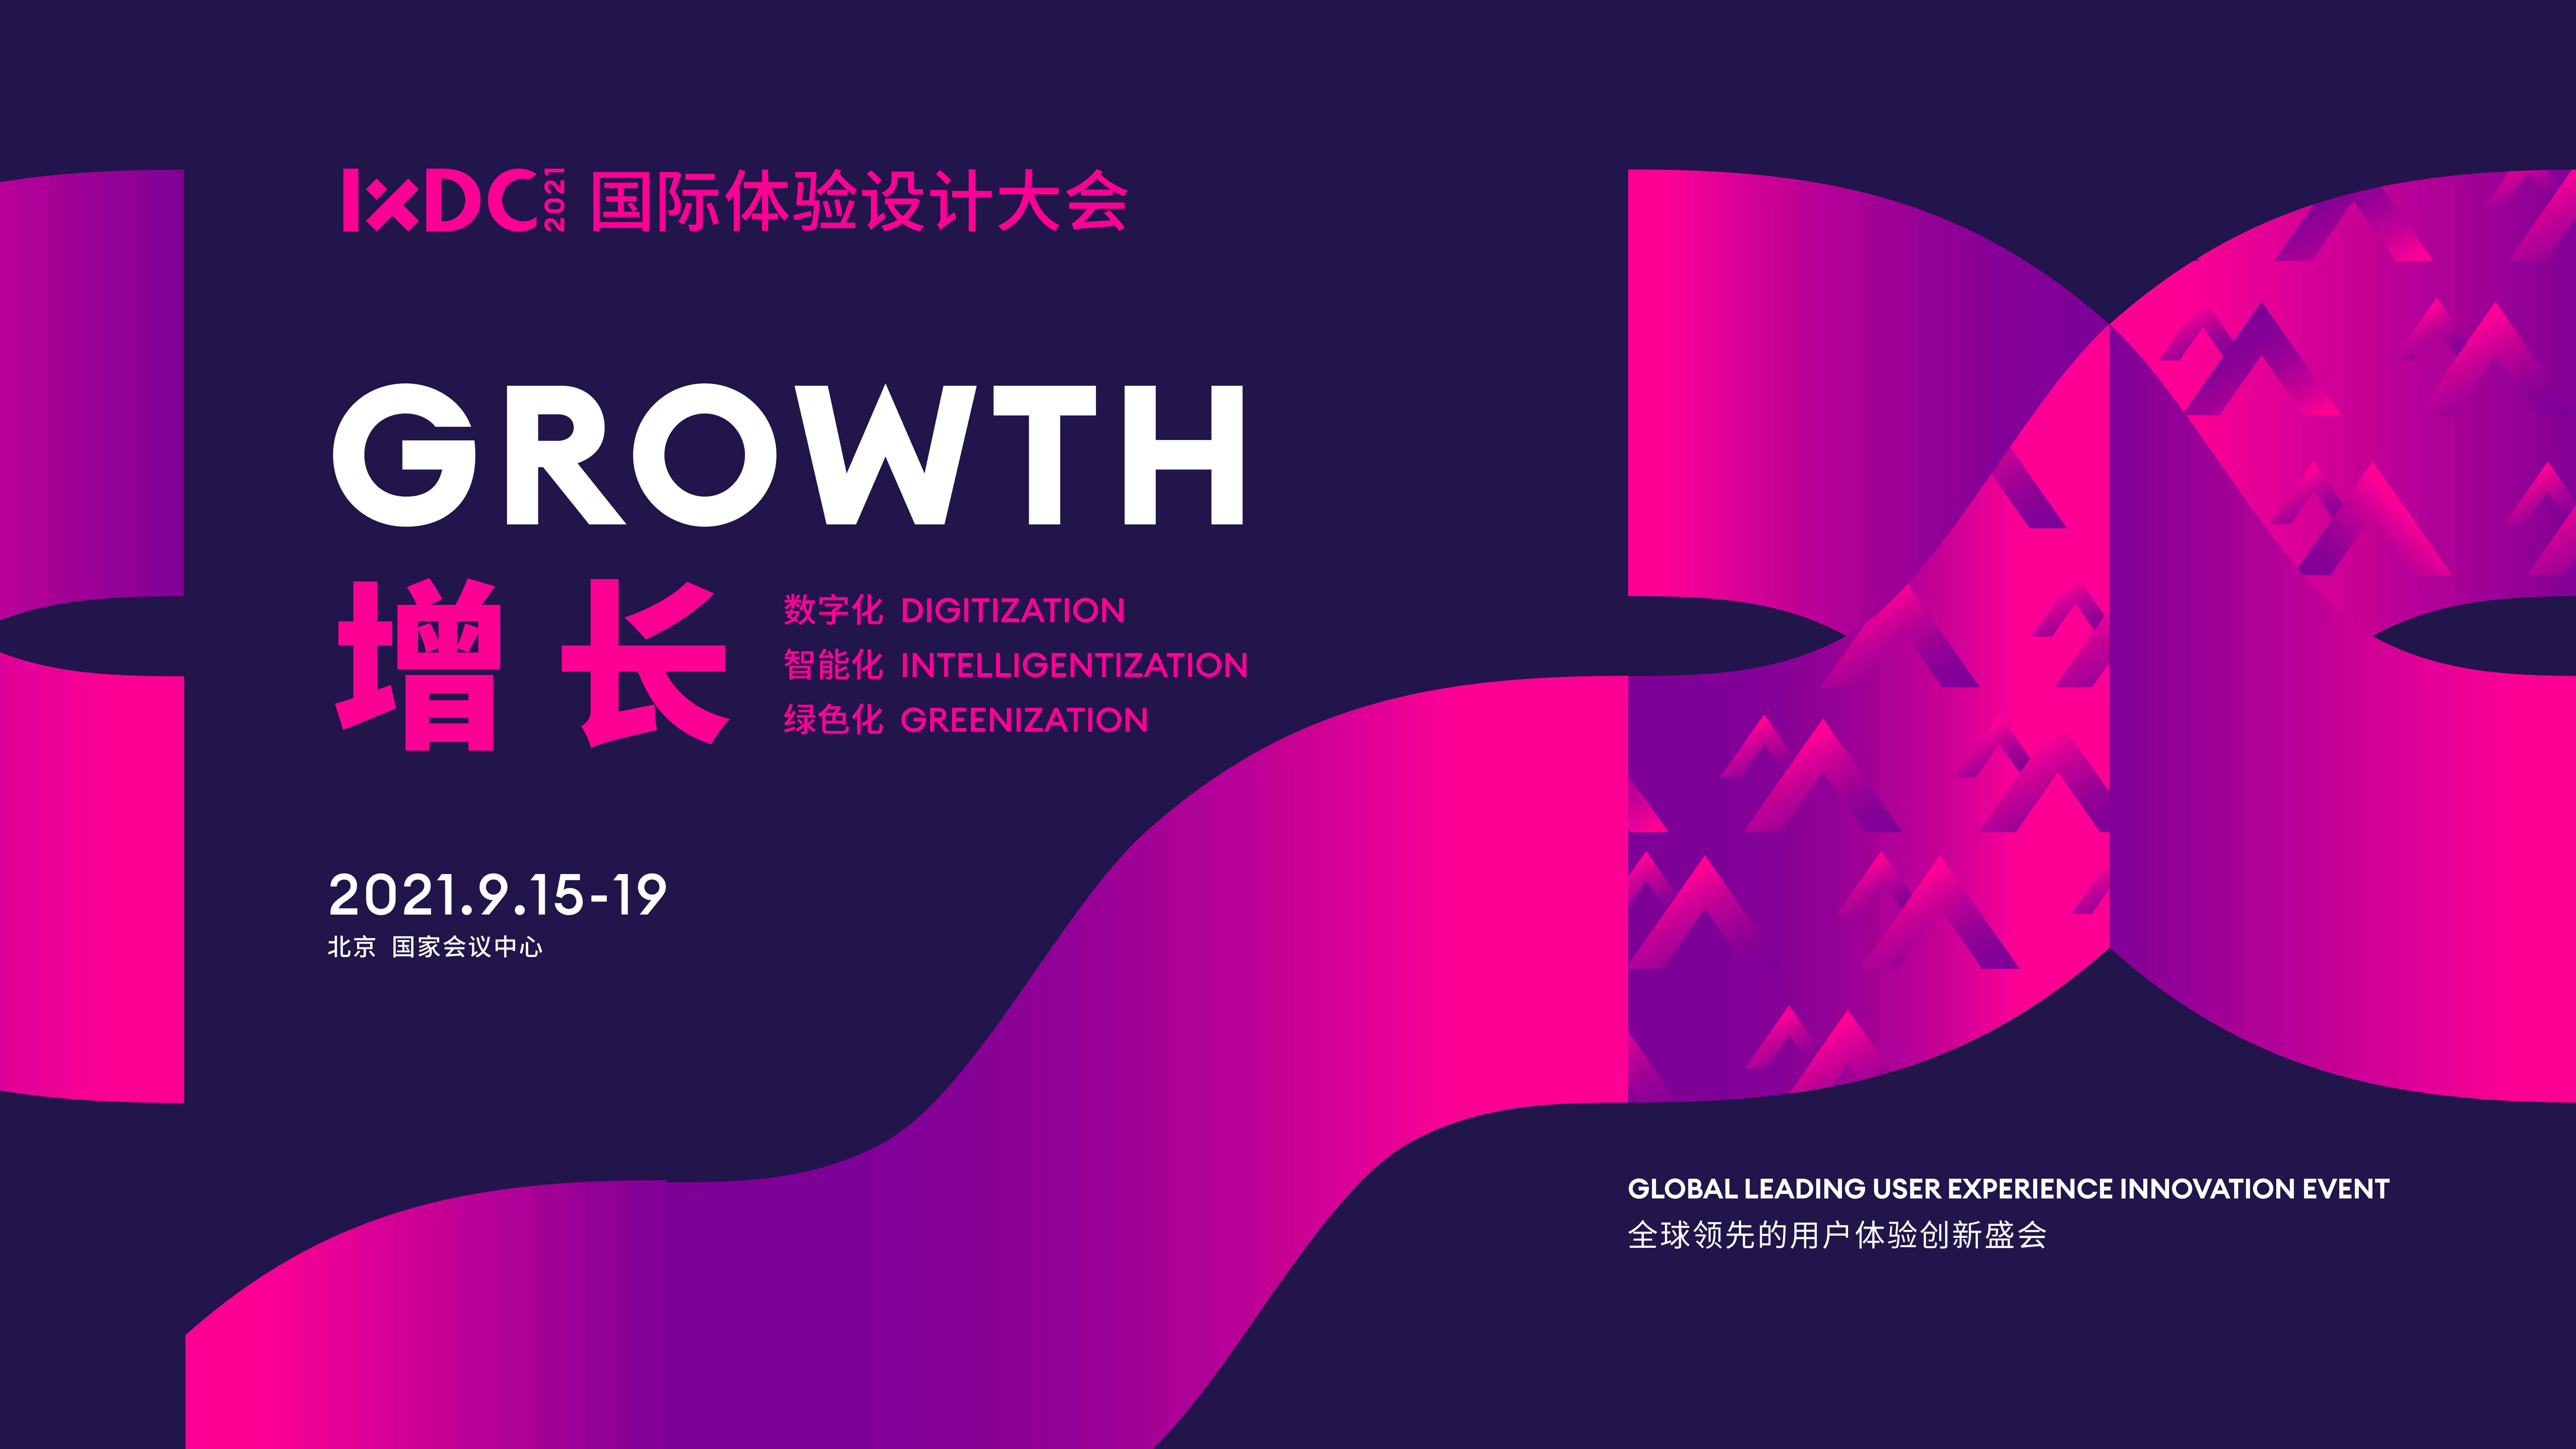 IXDC2021國際體驗設計大會